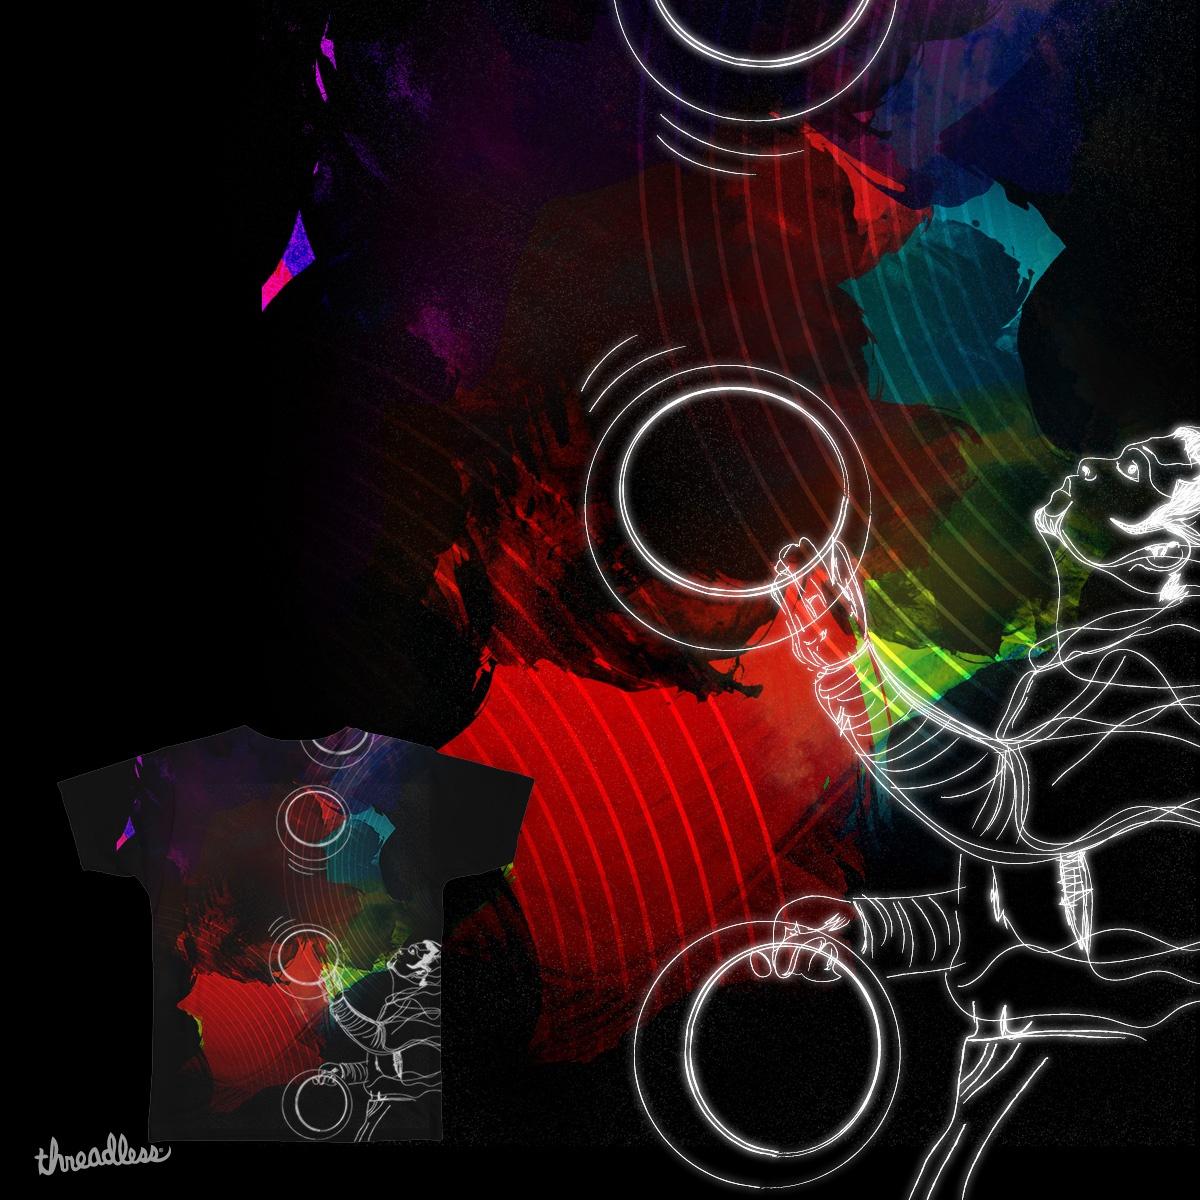 The Juglar - Circus of Imagination by rohan.jha.792 on Threadless